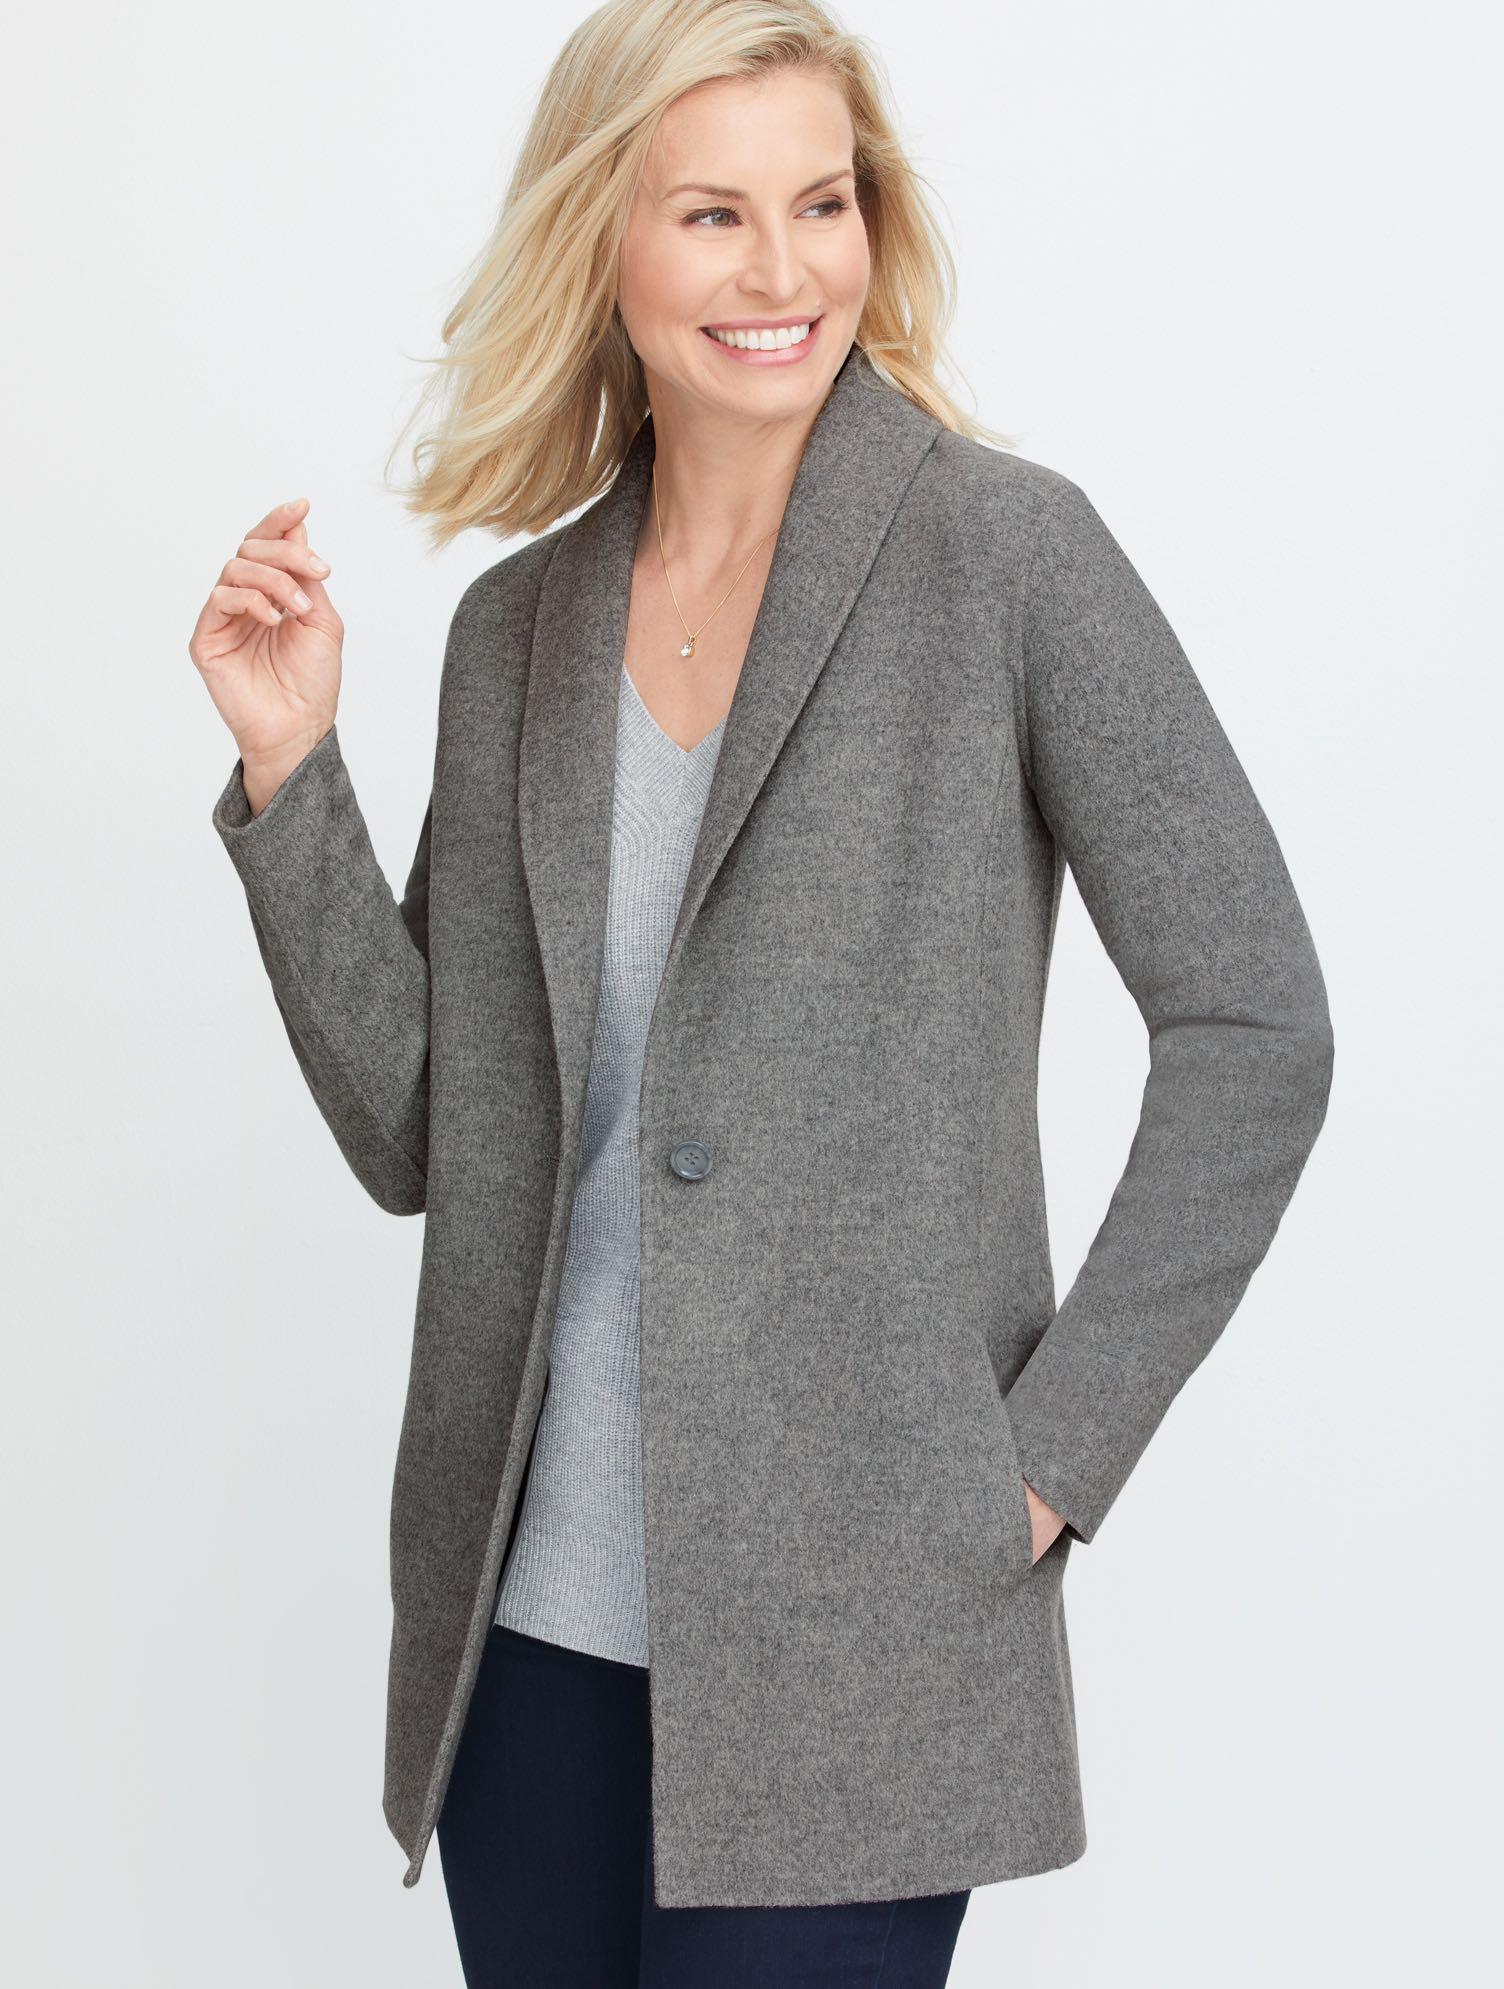 Vintage Coats & Jackets | Retro Coats and Jackets Shawl Collar Double Face Blazer - Mist Heather - 16 Talbots $289.00 AT vintagedancer.com